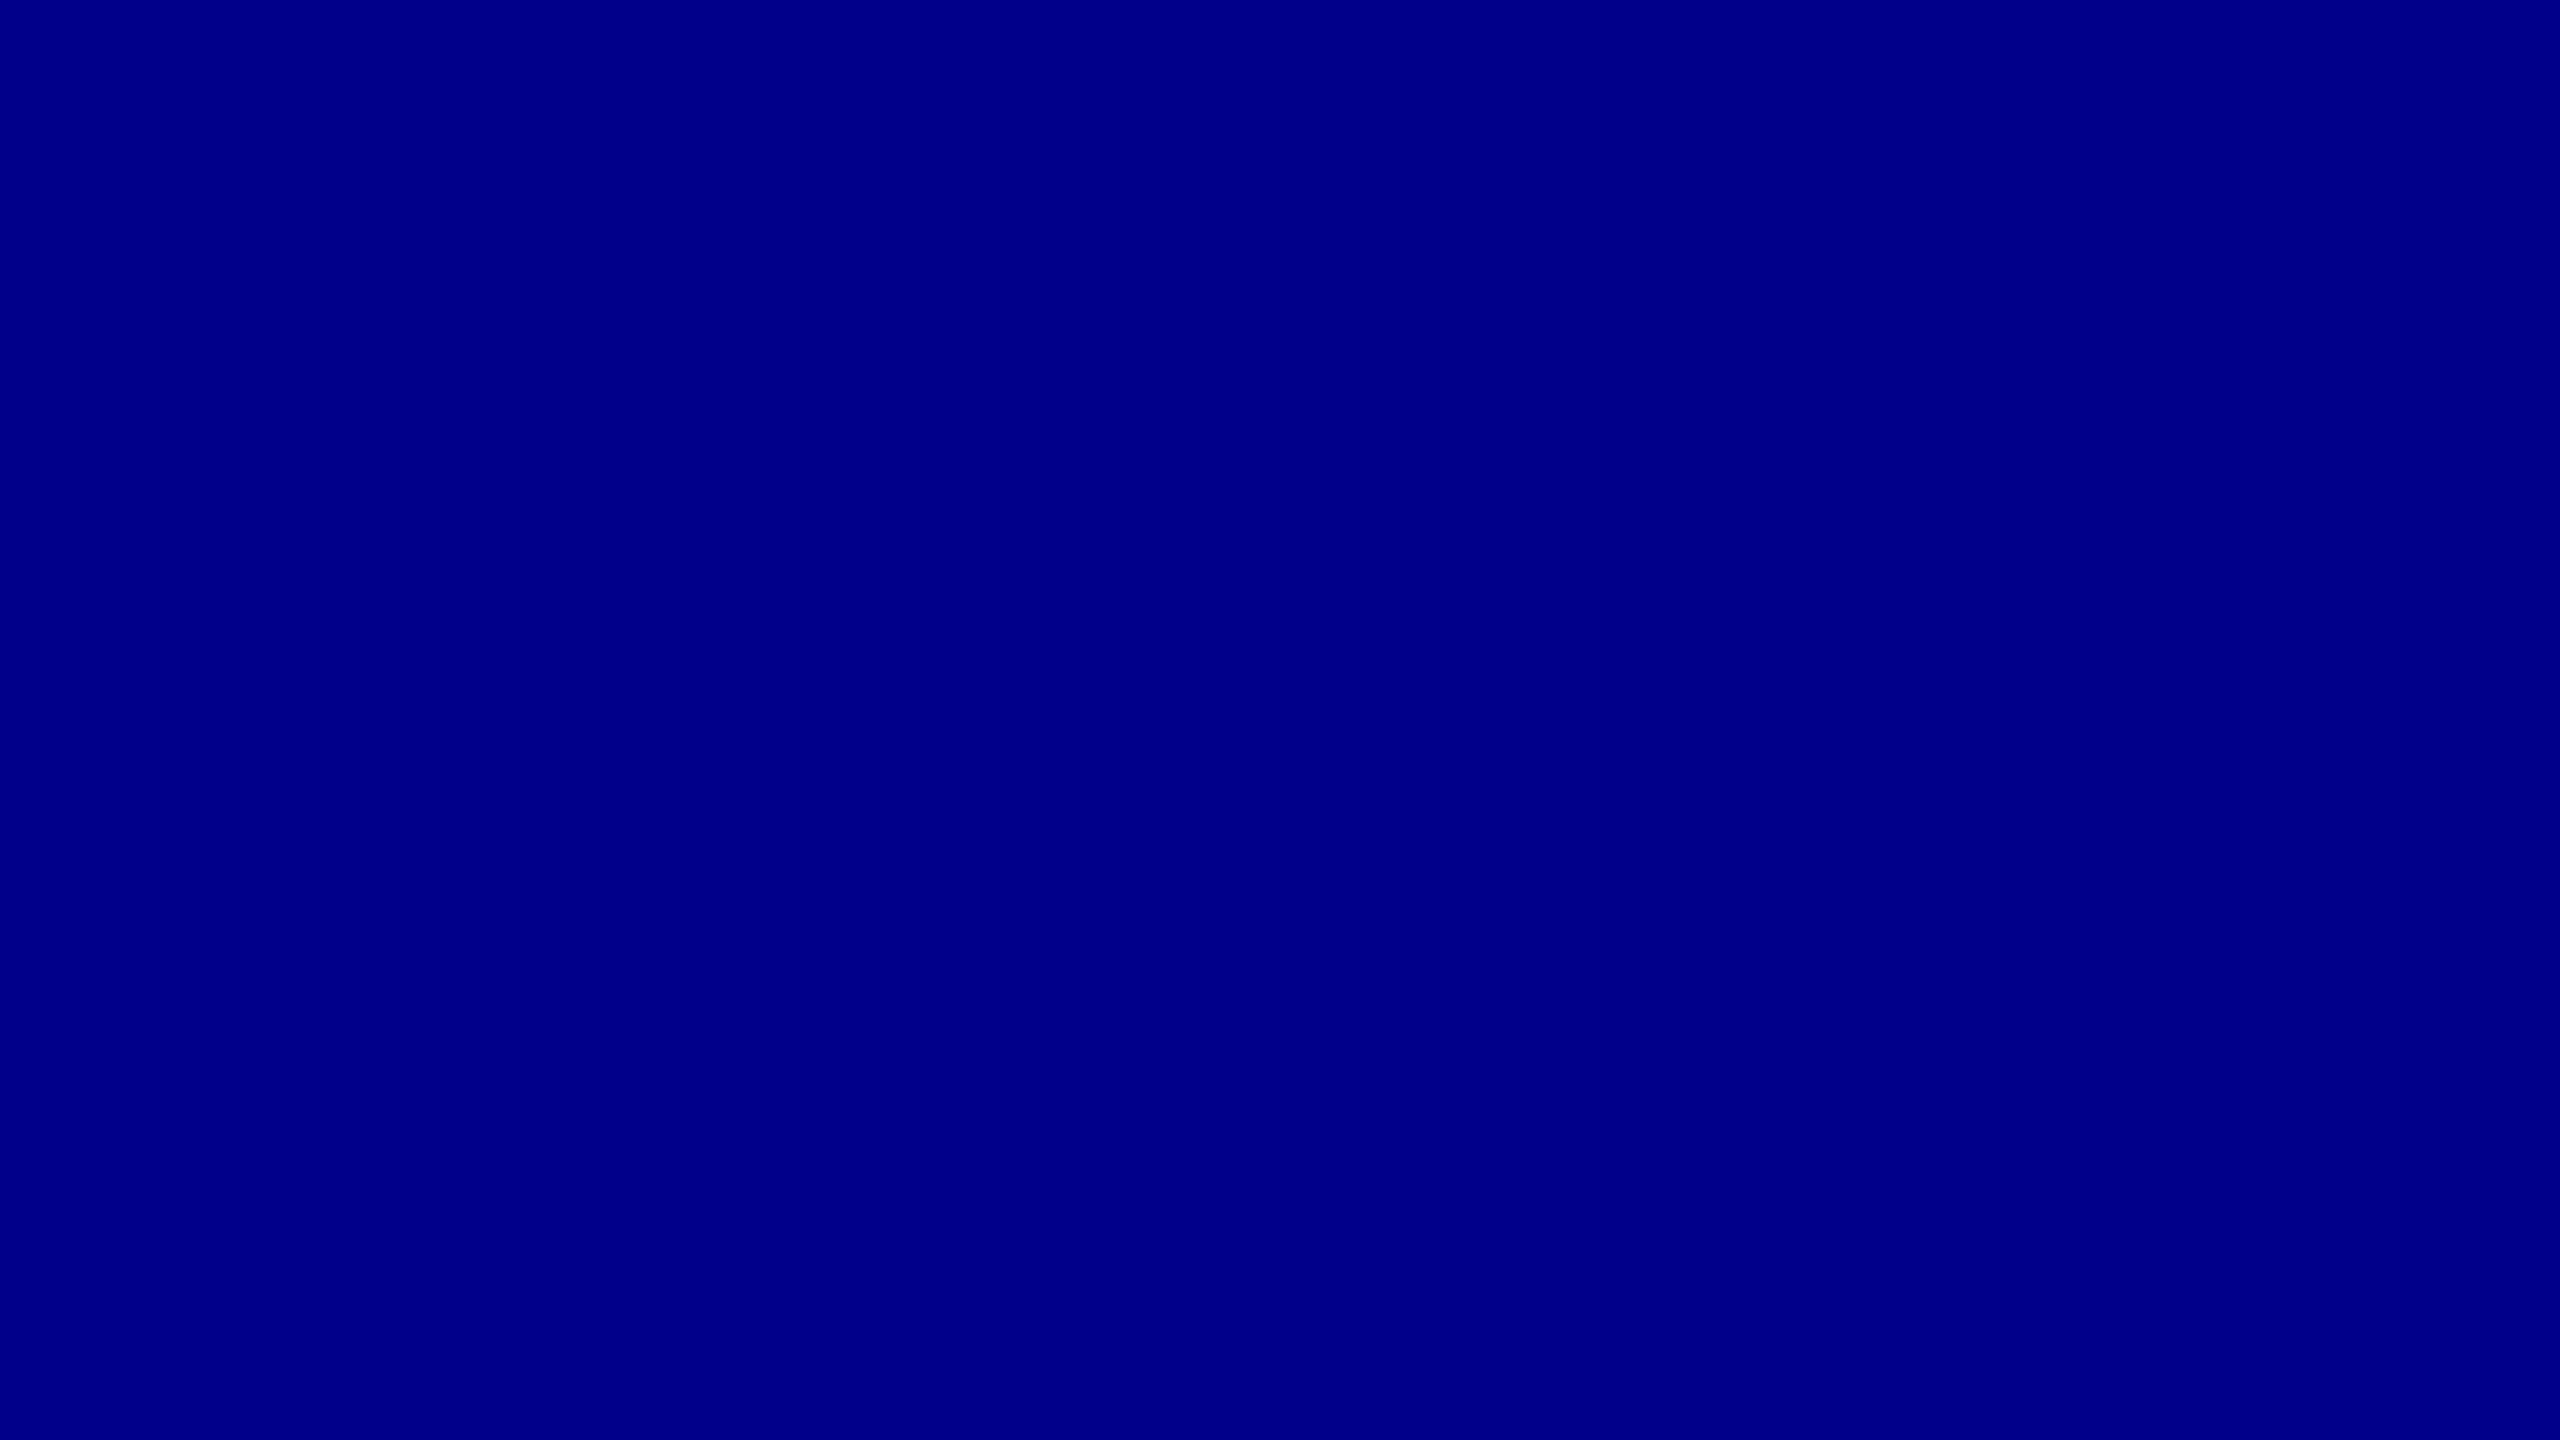 Pantone Color Of The Year 2014 wallpaper   1014671 2560x1440